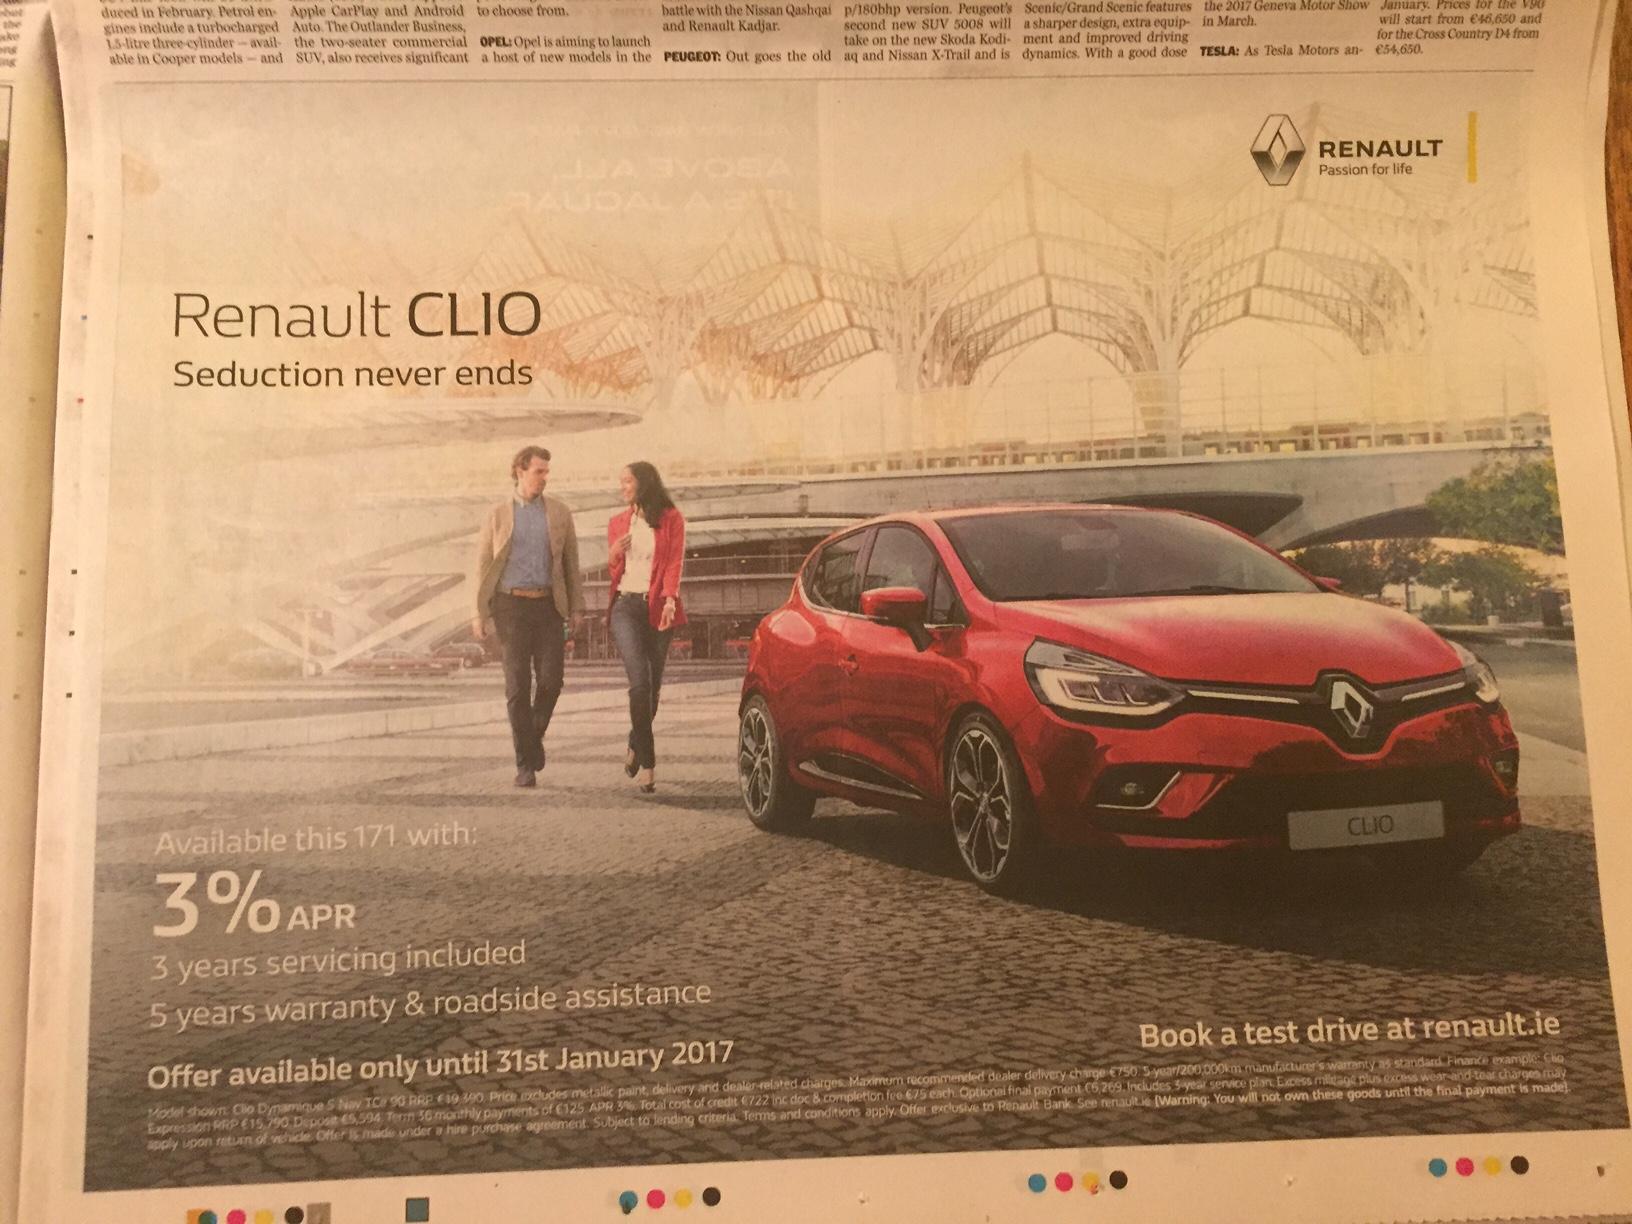 Renault Clio – seduction never ends